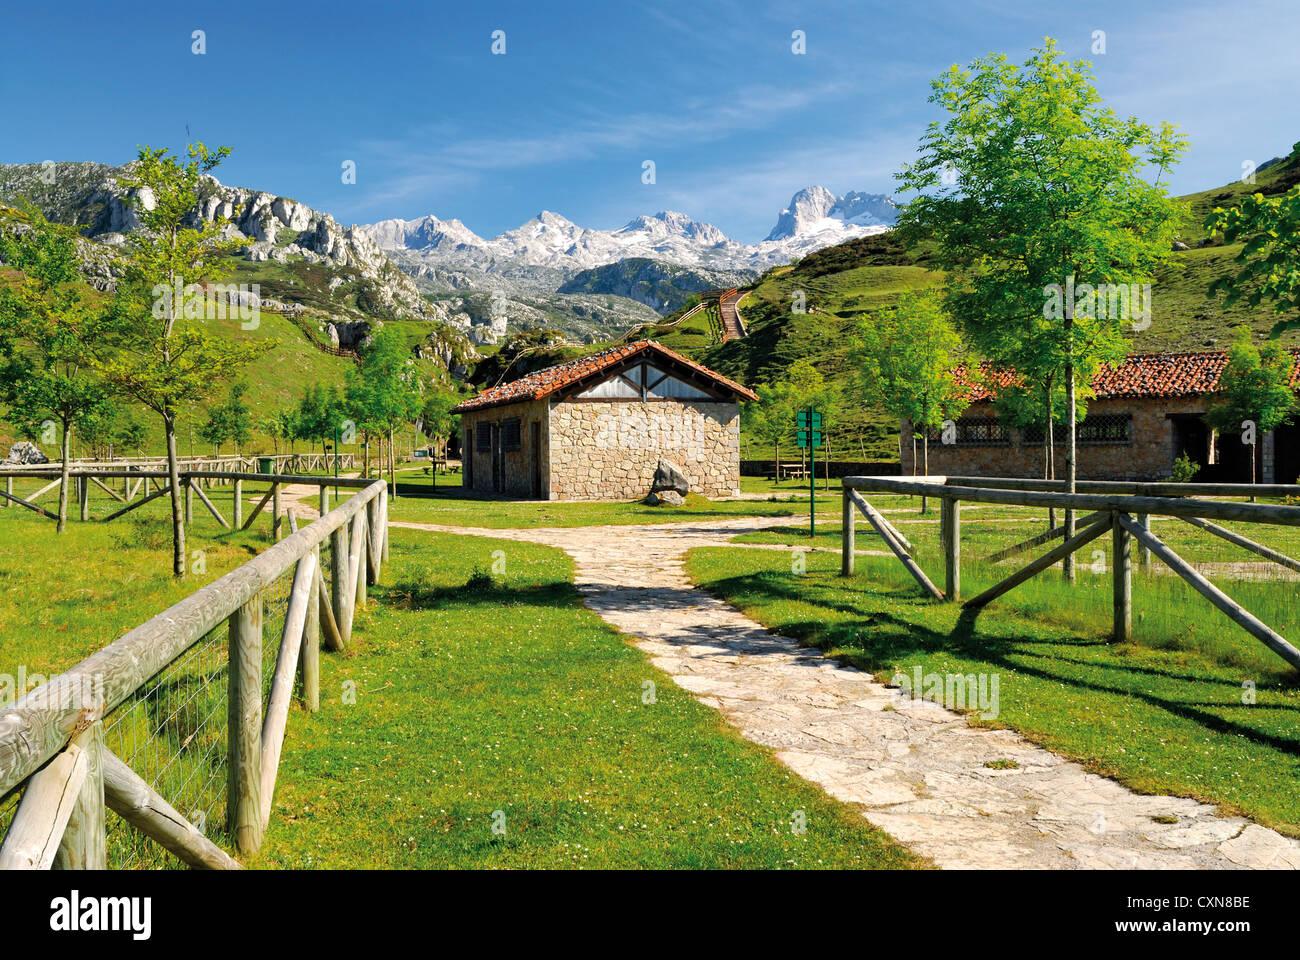 Spain, Asturias: Mountain view in the National Park Picos de Europa - Stock Image